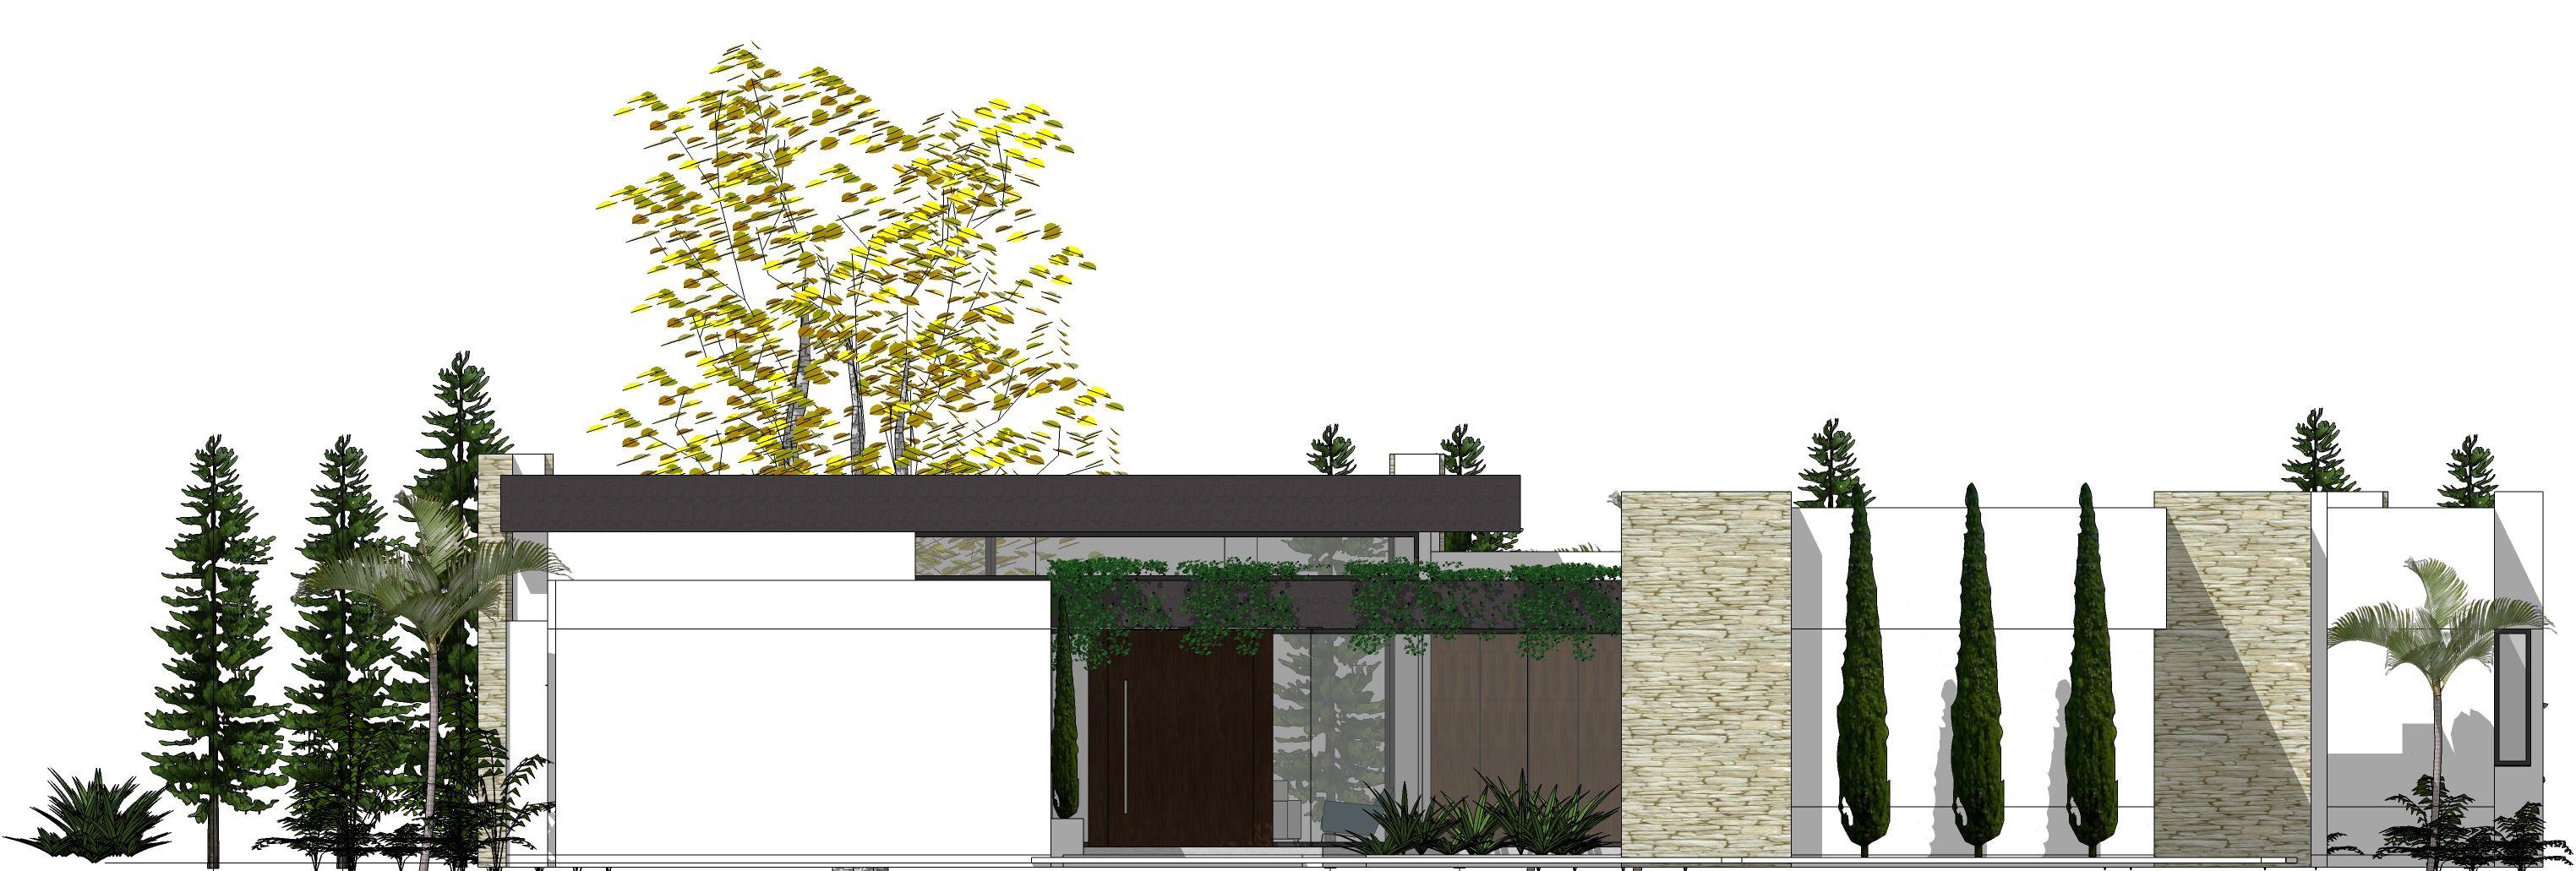 Diseño casa palma alta el retiro